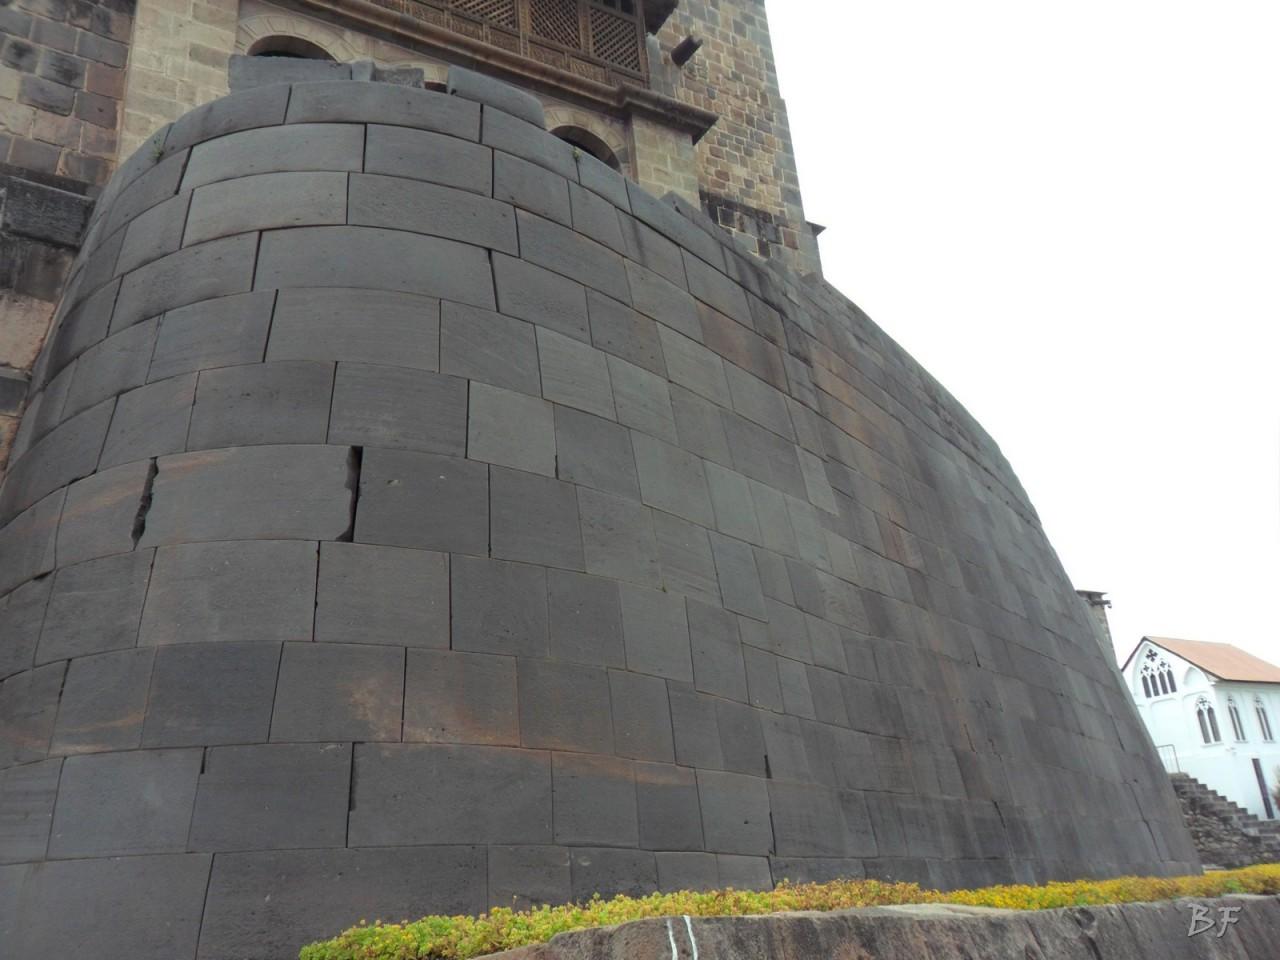 1_Mura-Poligonali-Megaliti-Tempio-Coricancha-Cusco-Perù-8